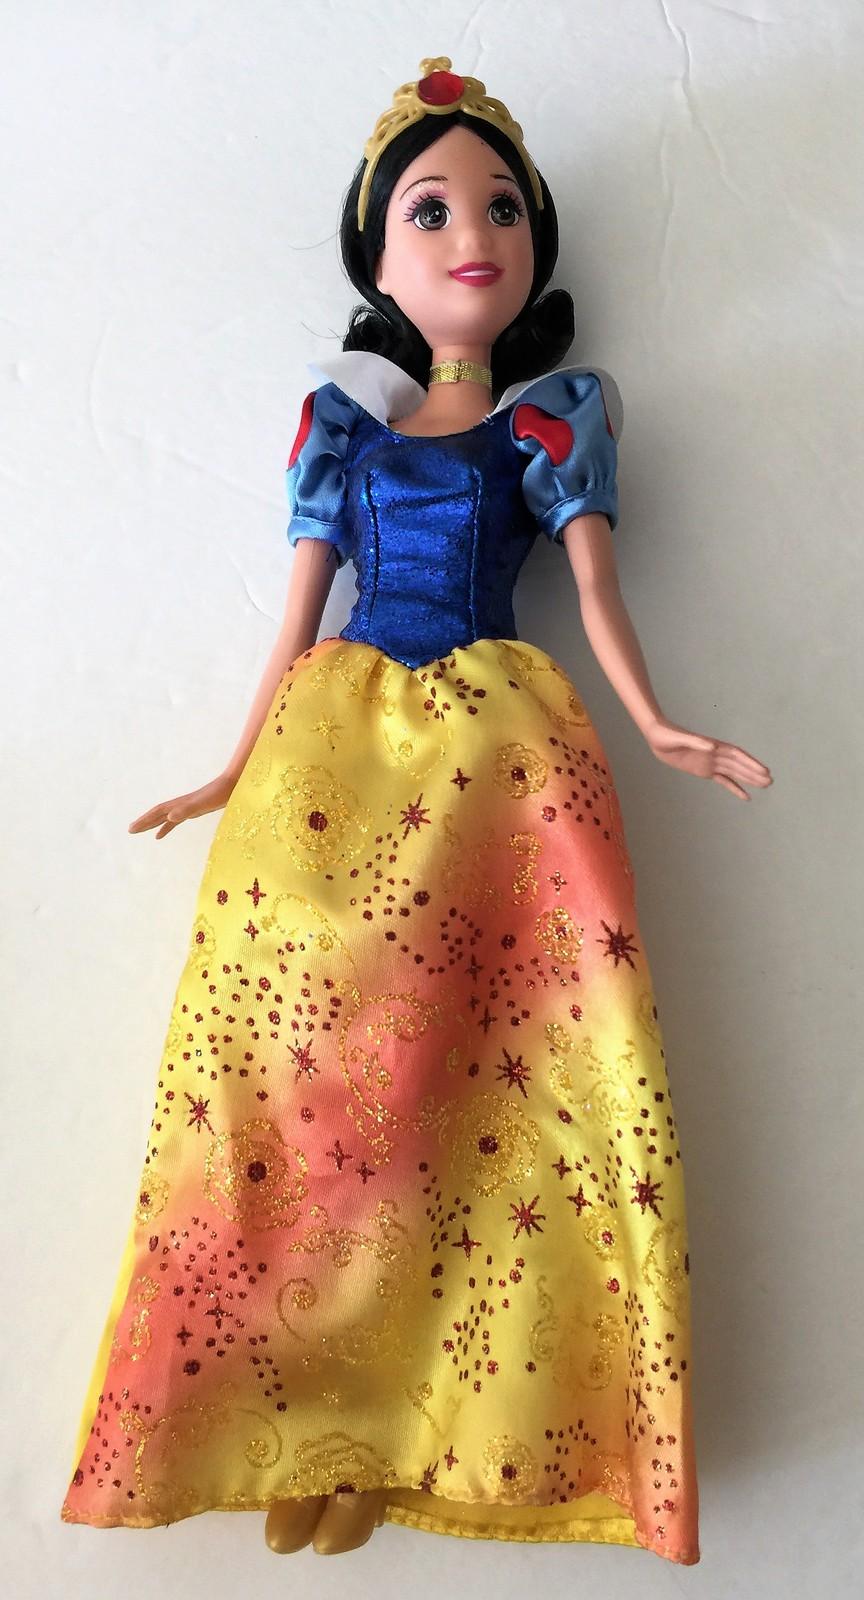 American Girl Hangers NIB NRFB MYAG Doll Clothes